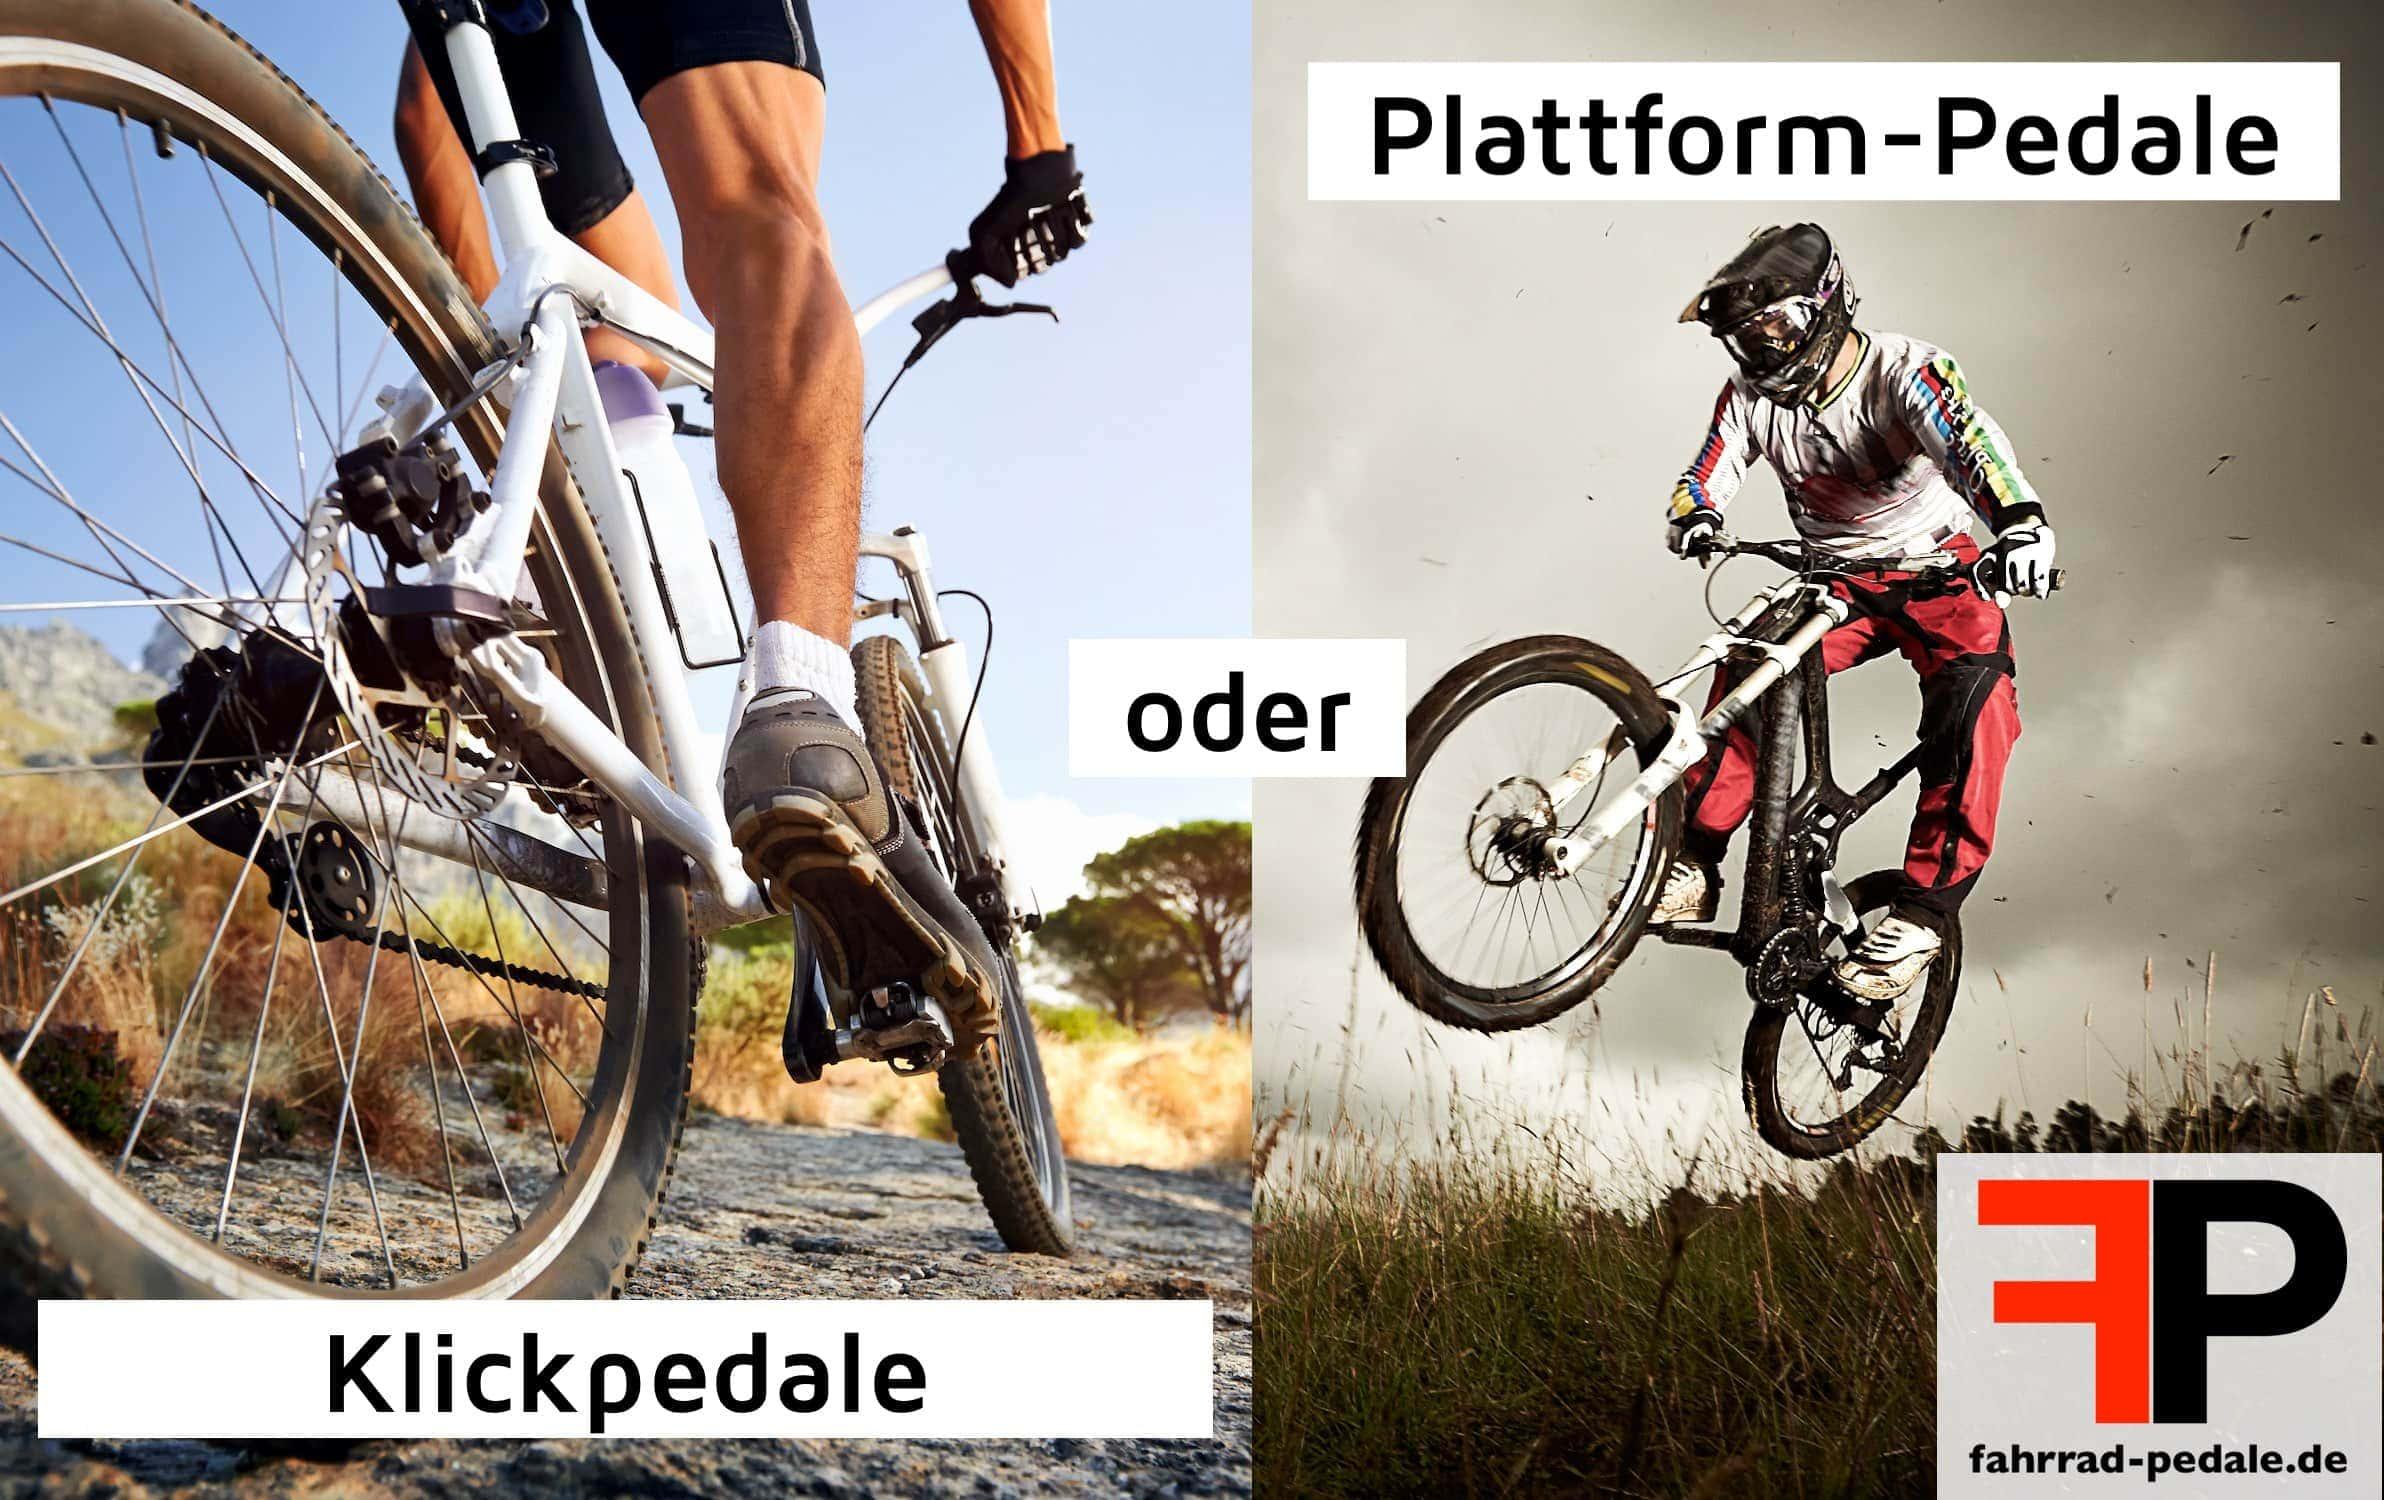 klickpedale vs normale pedale welche sind effizienter